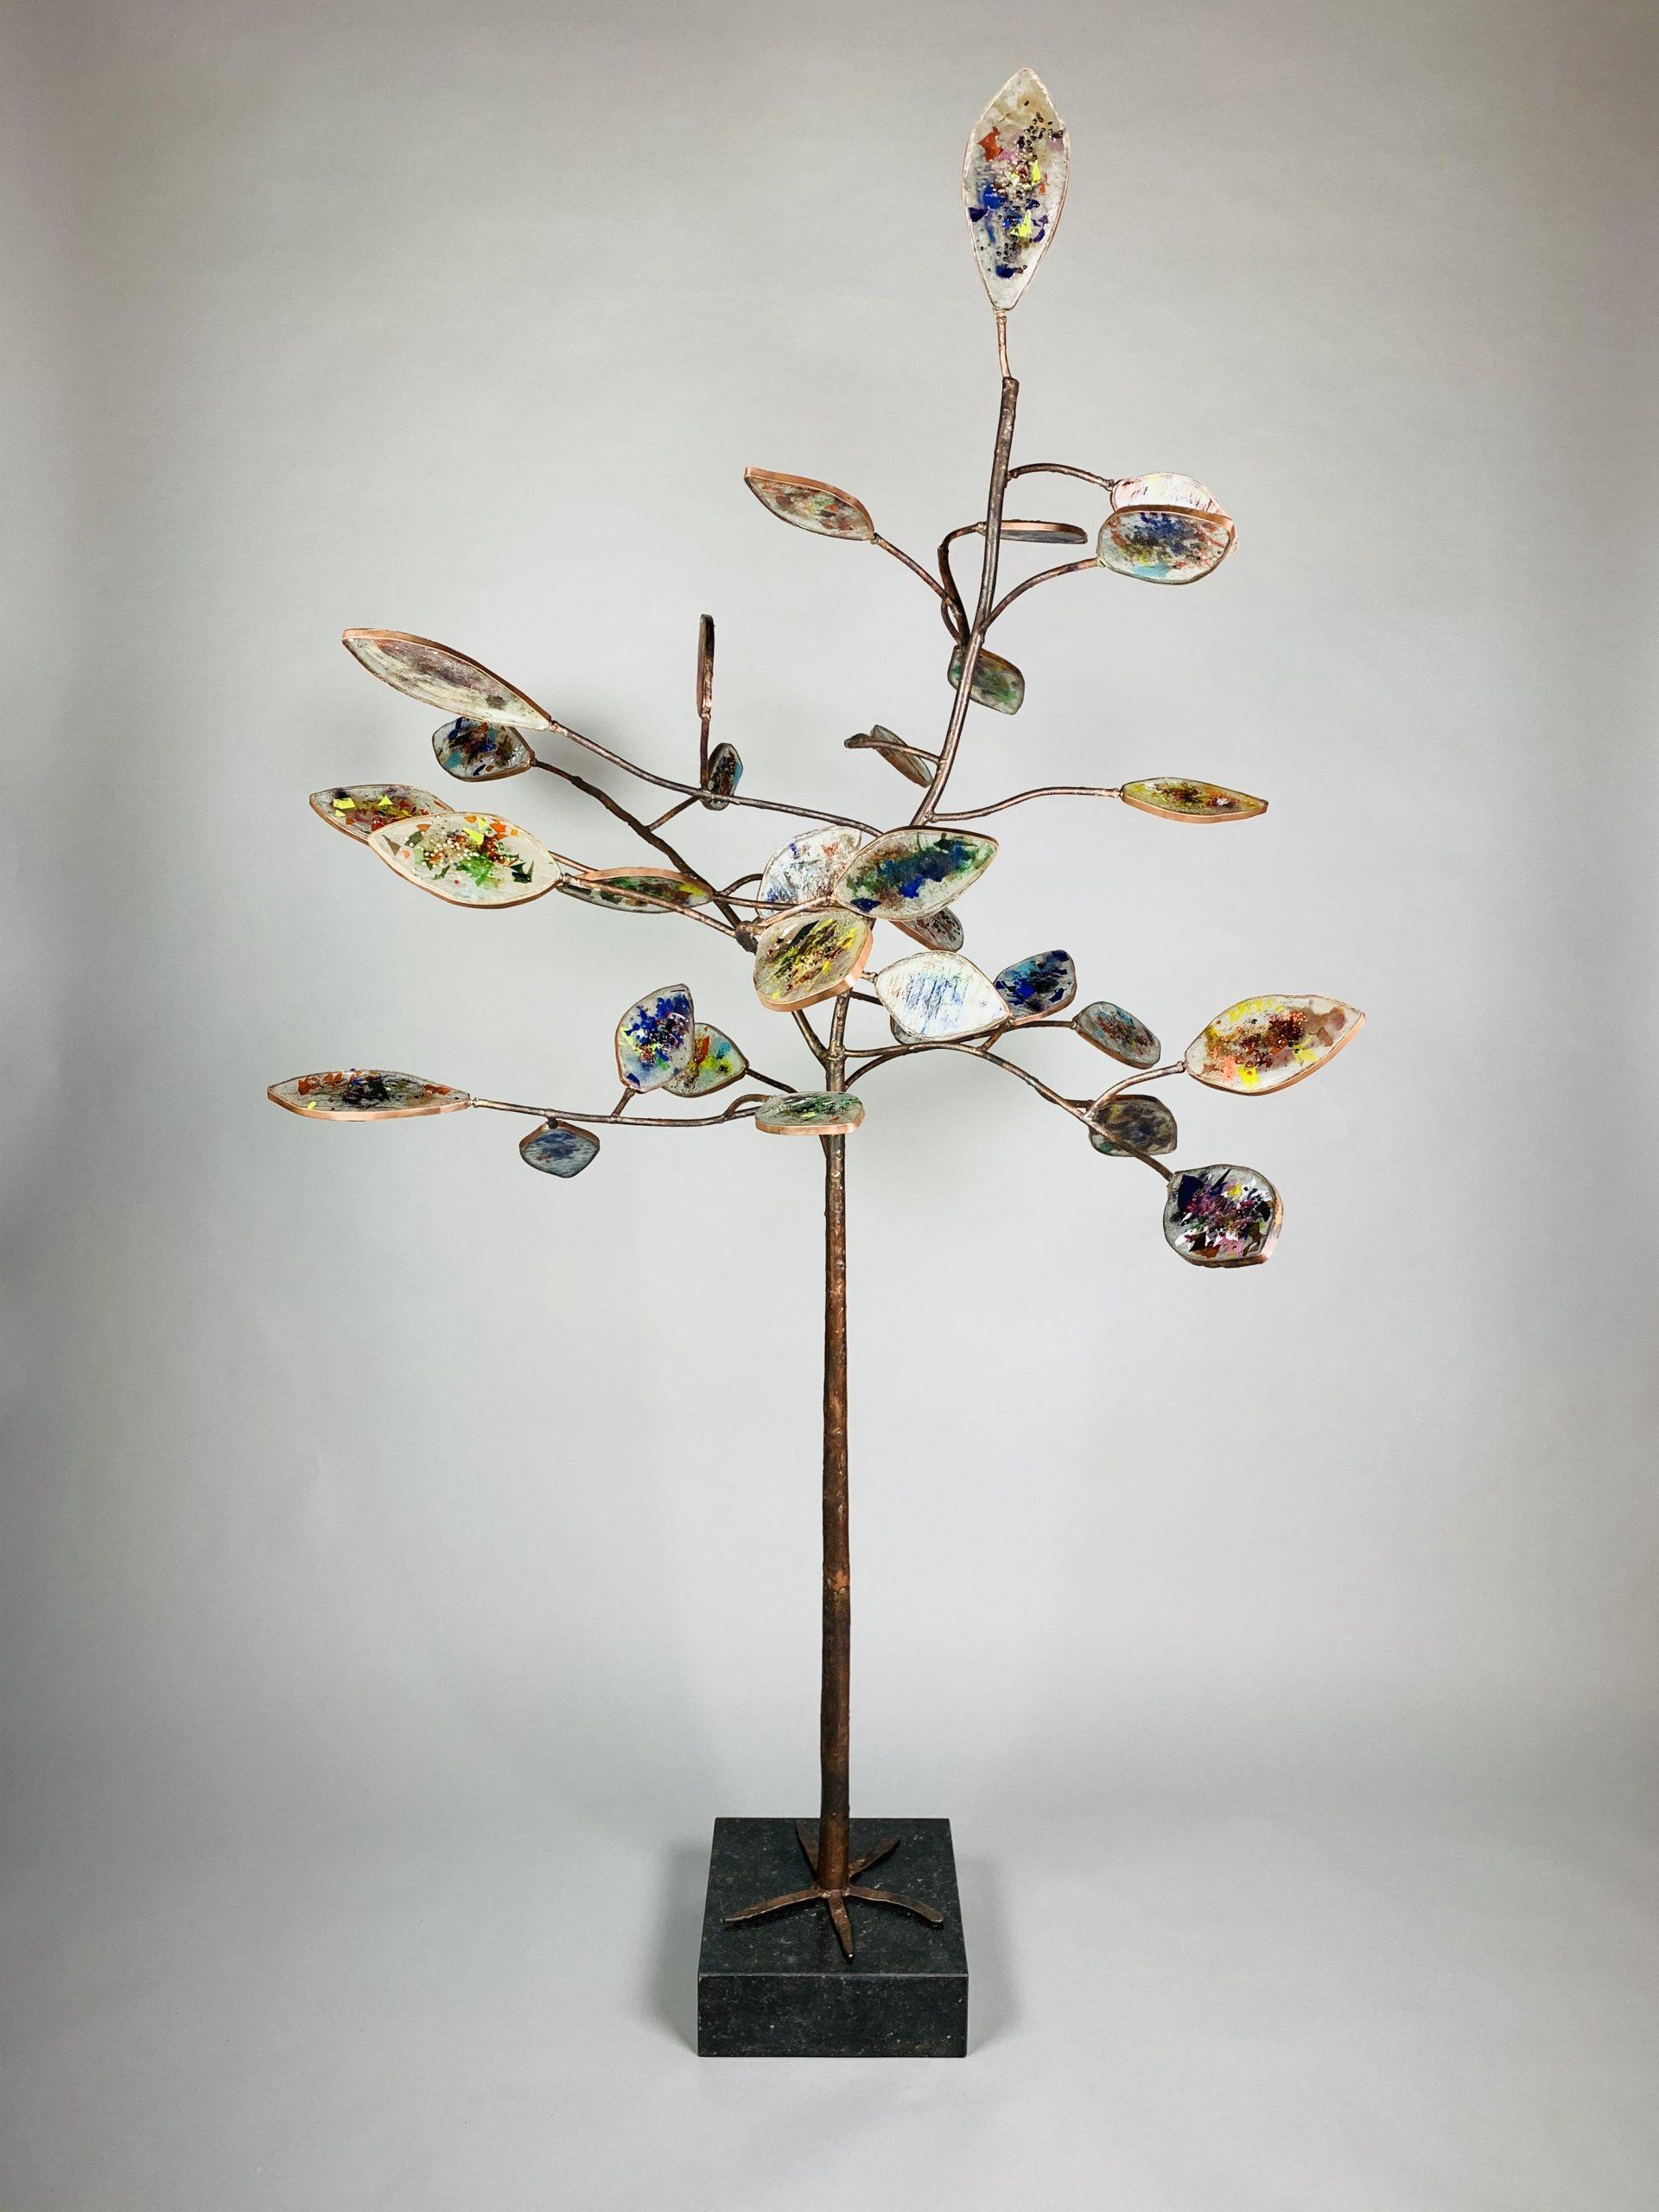 Tree of life 2,05 hoog x1,45x1,35 SJAAK SMETSERS 7